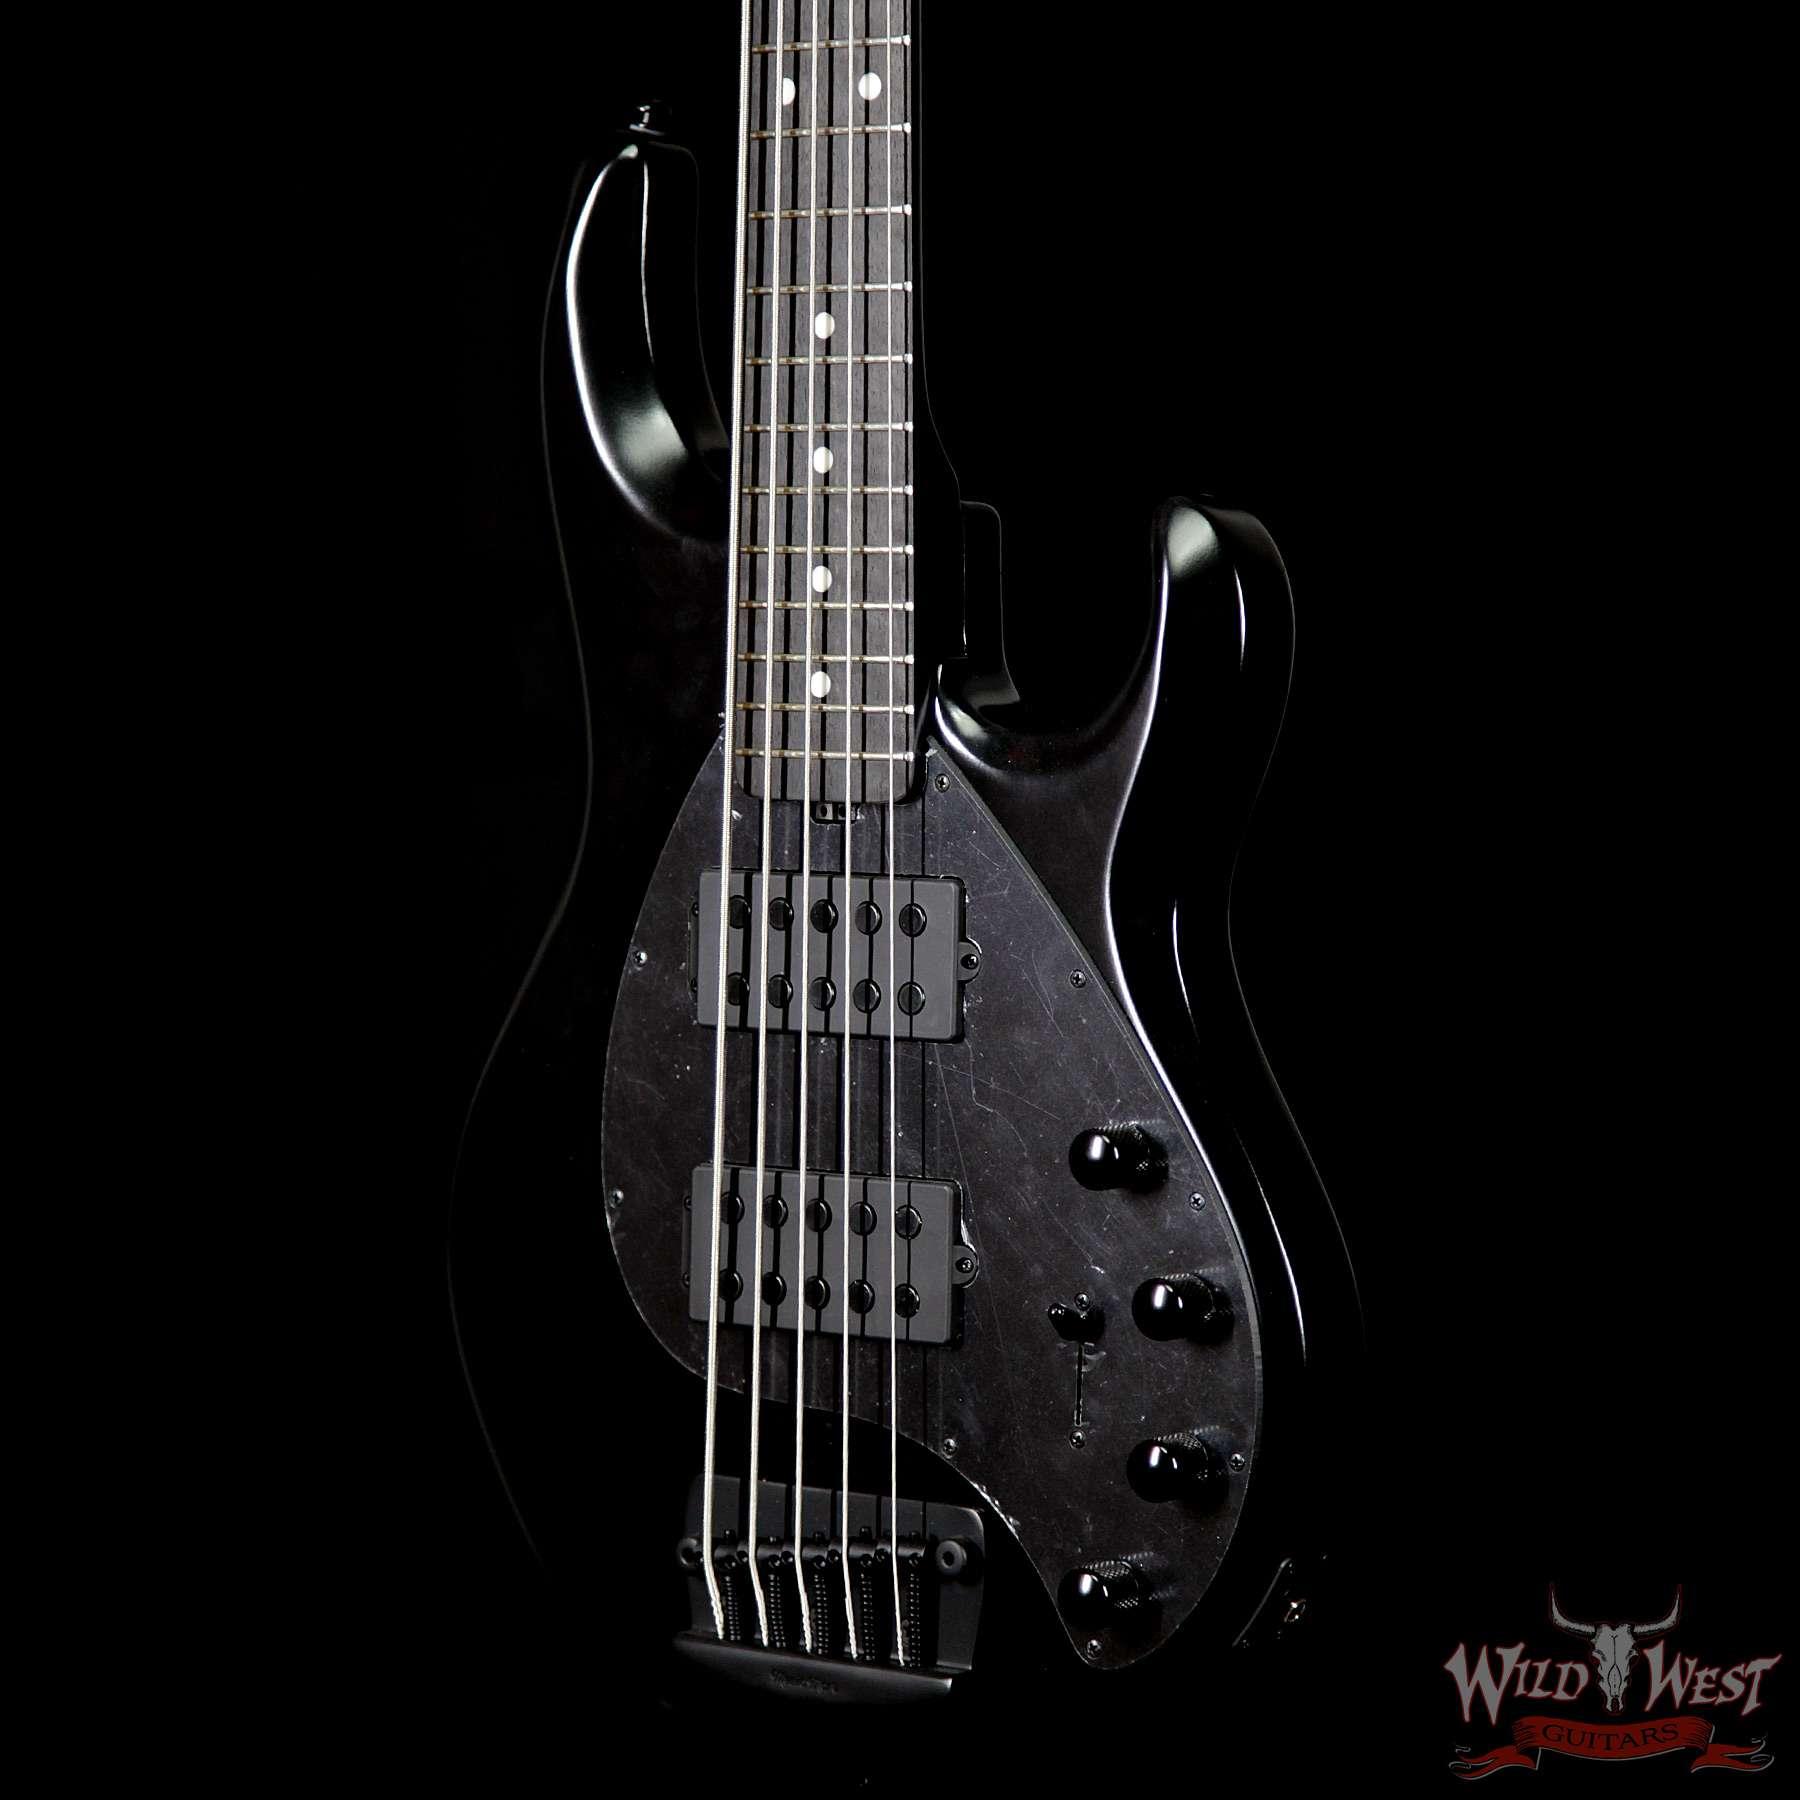 Ernie Ball Music Man Stingray5 Hh 5 Sting Bass Stealth Black Wild